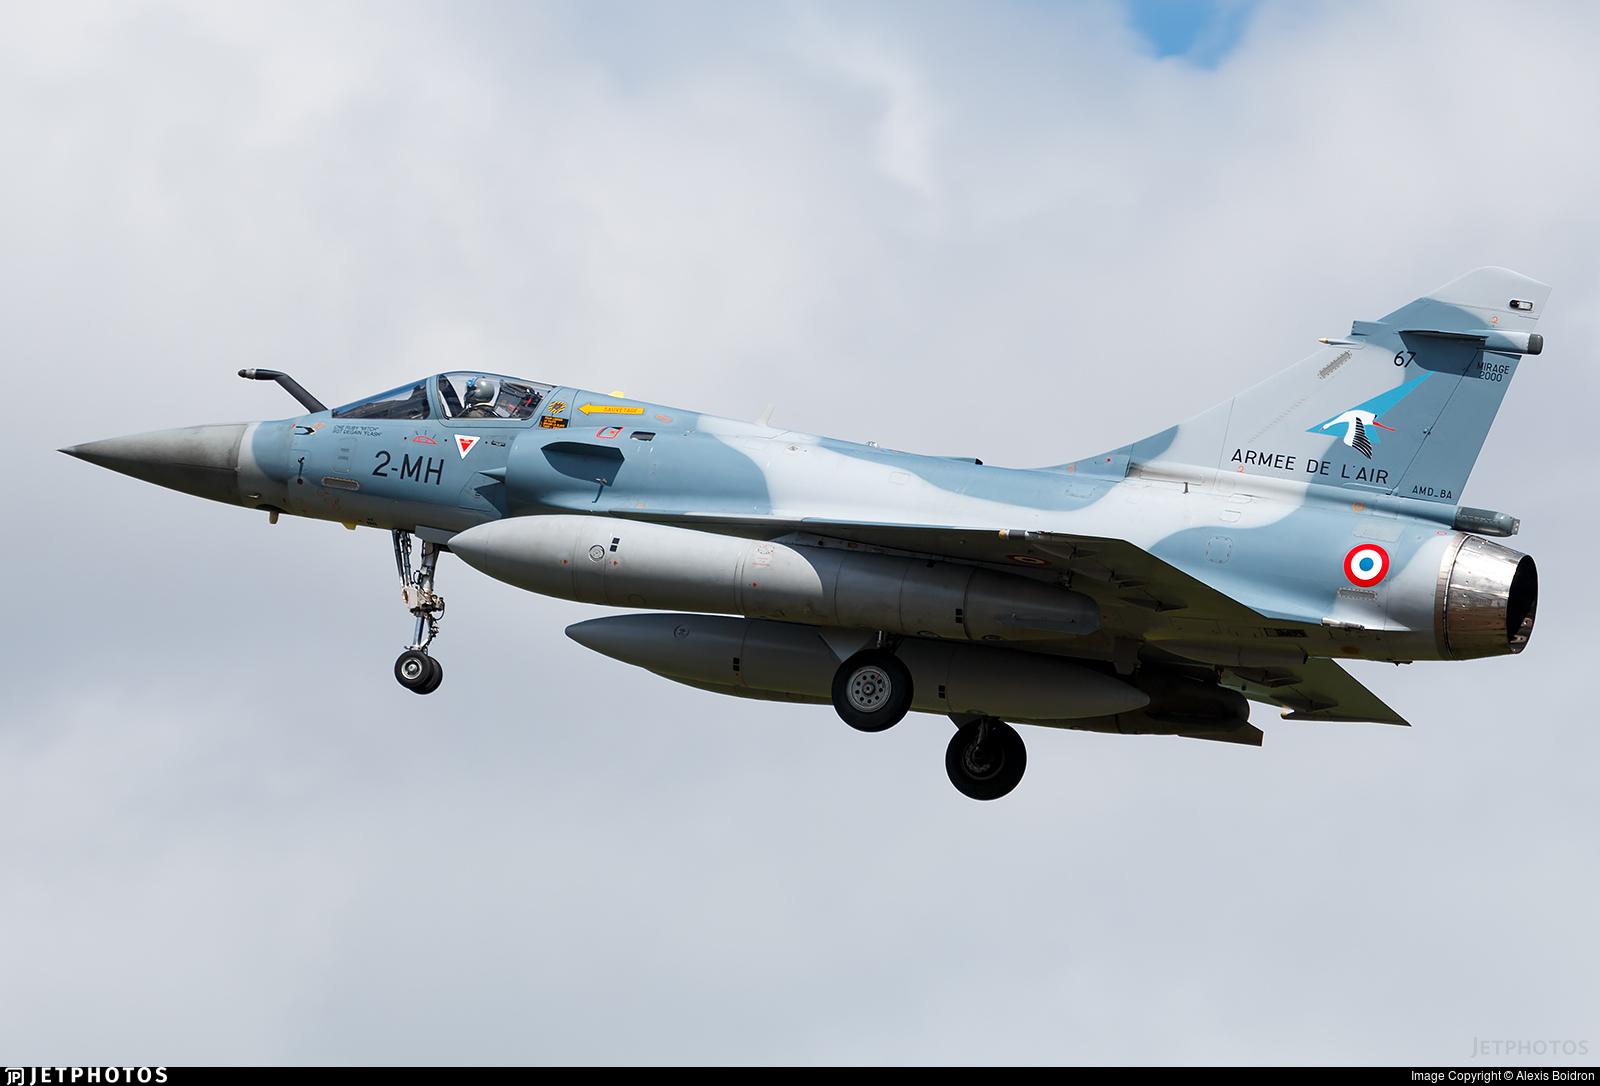 67 - Dassault Mirage 2000-5F - France - Air Force